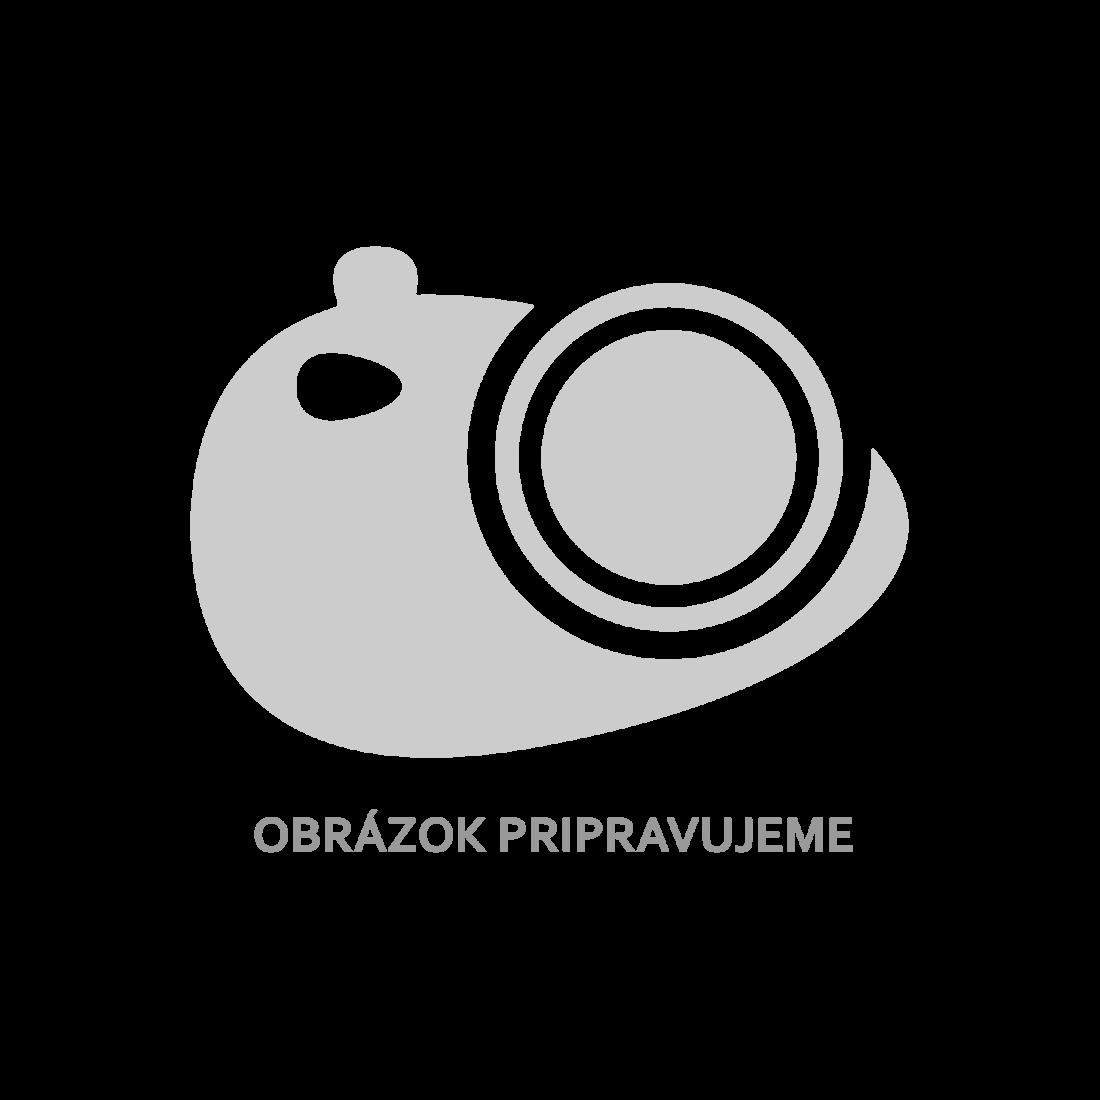 Stolík v tvare misky z recyklovaného dreva s oceľovou základňou